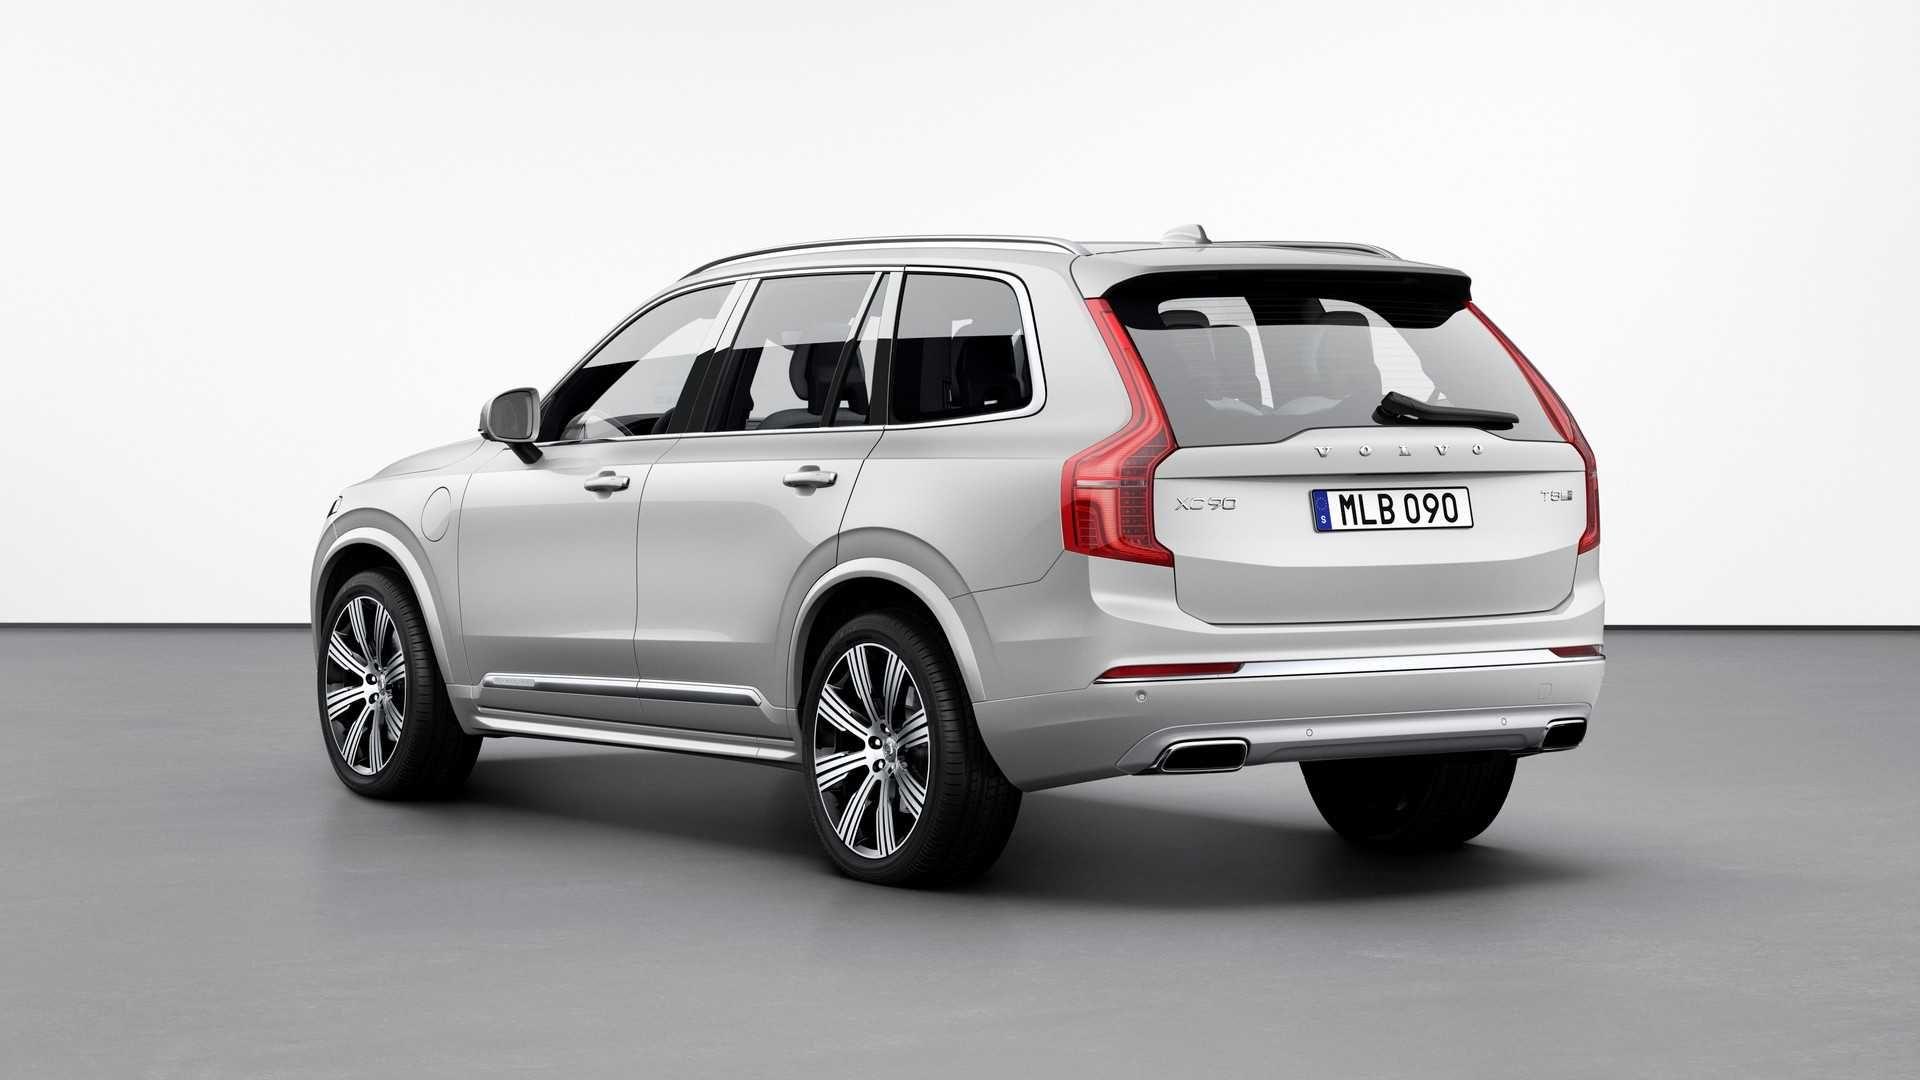 2020 Volvo Xc90 Refresh Brings Kers Hybrid Powertrain Volvo Volvo Suv Volvo Xc90